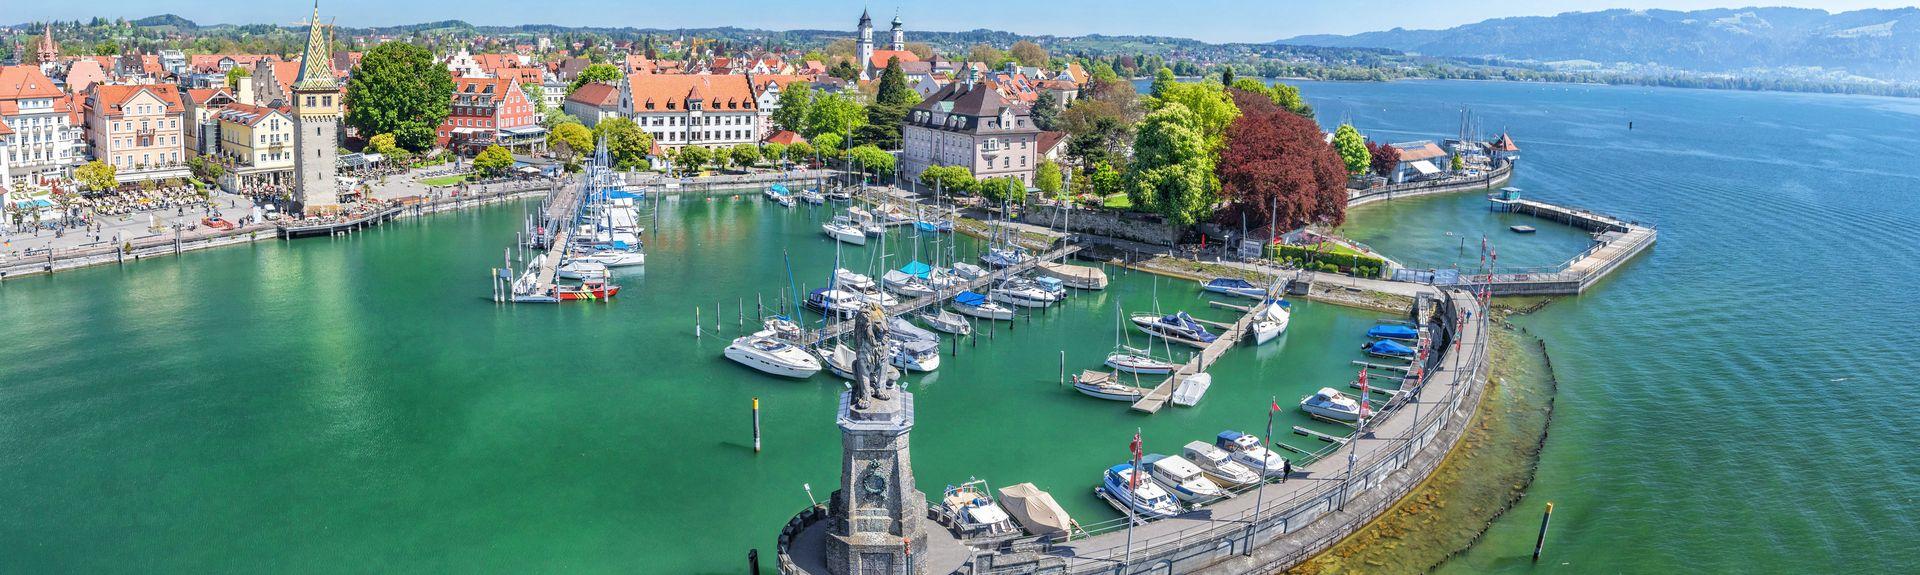 Lake Constance Promenade, Friedrichshafen, Germany